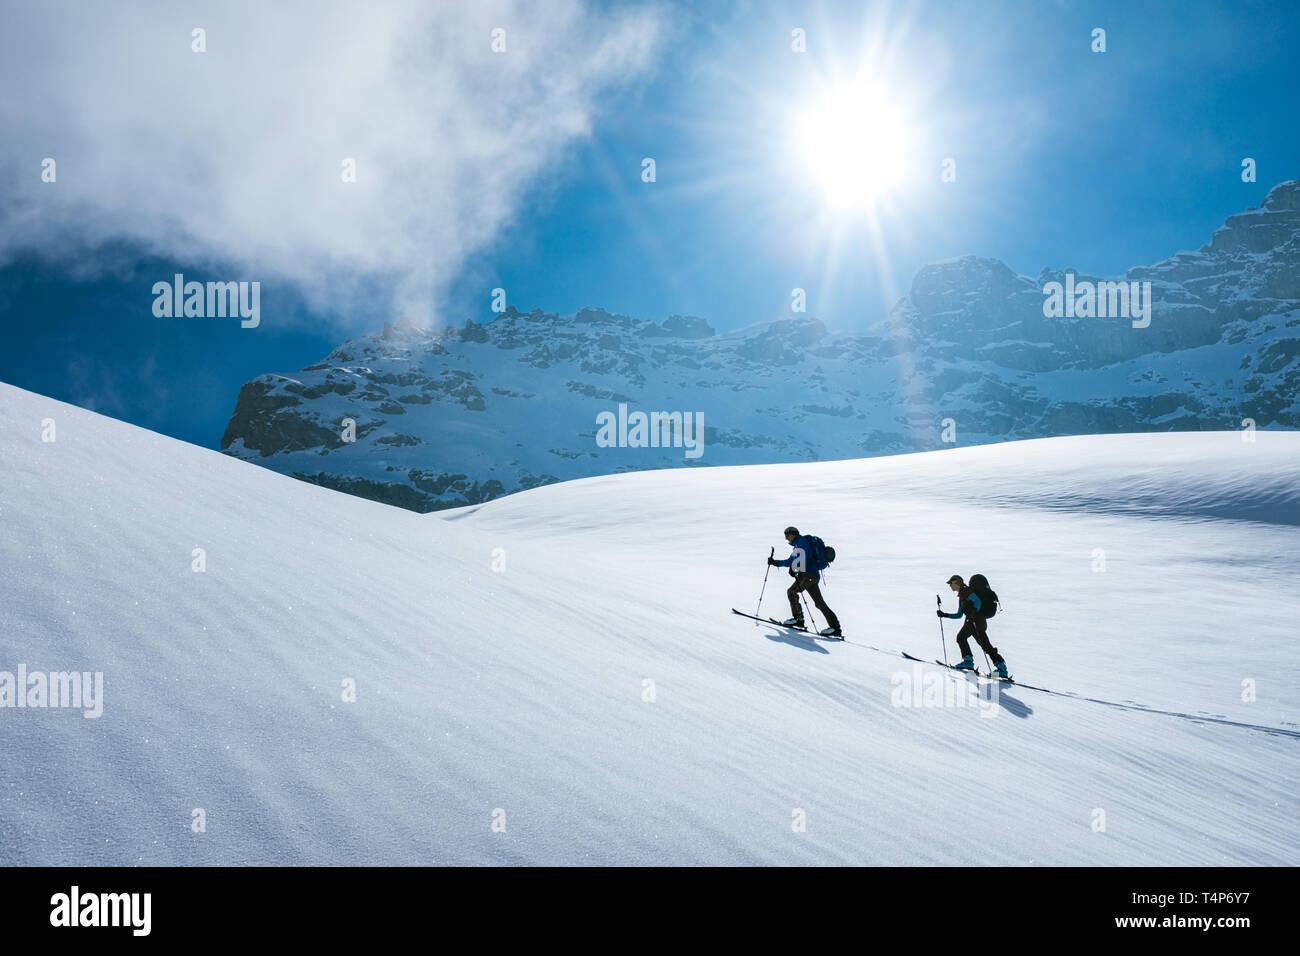 Tour skiing in Switzerland - Stock Image